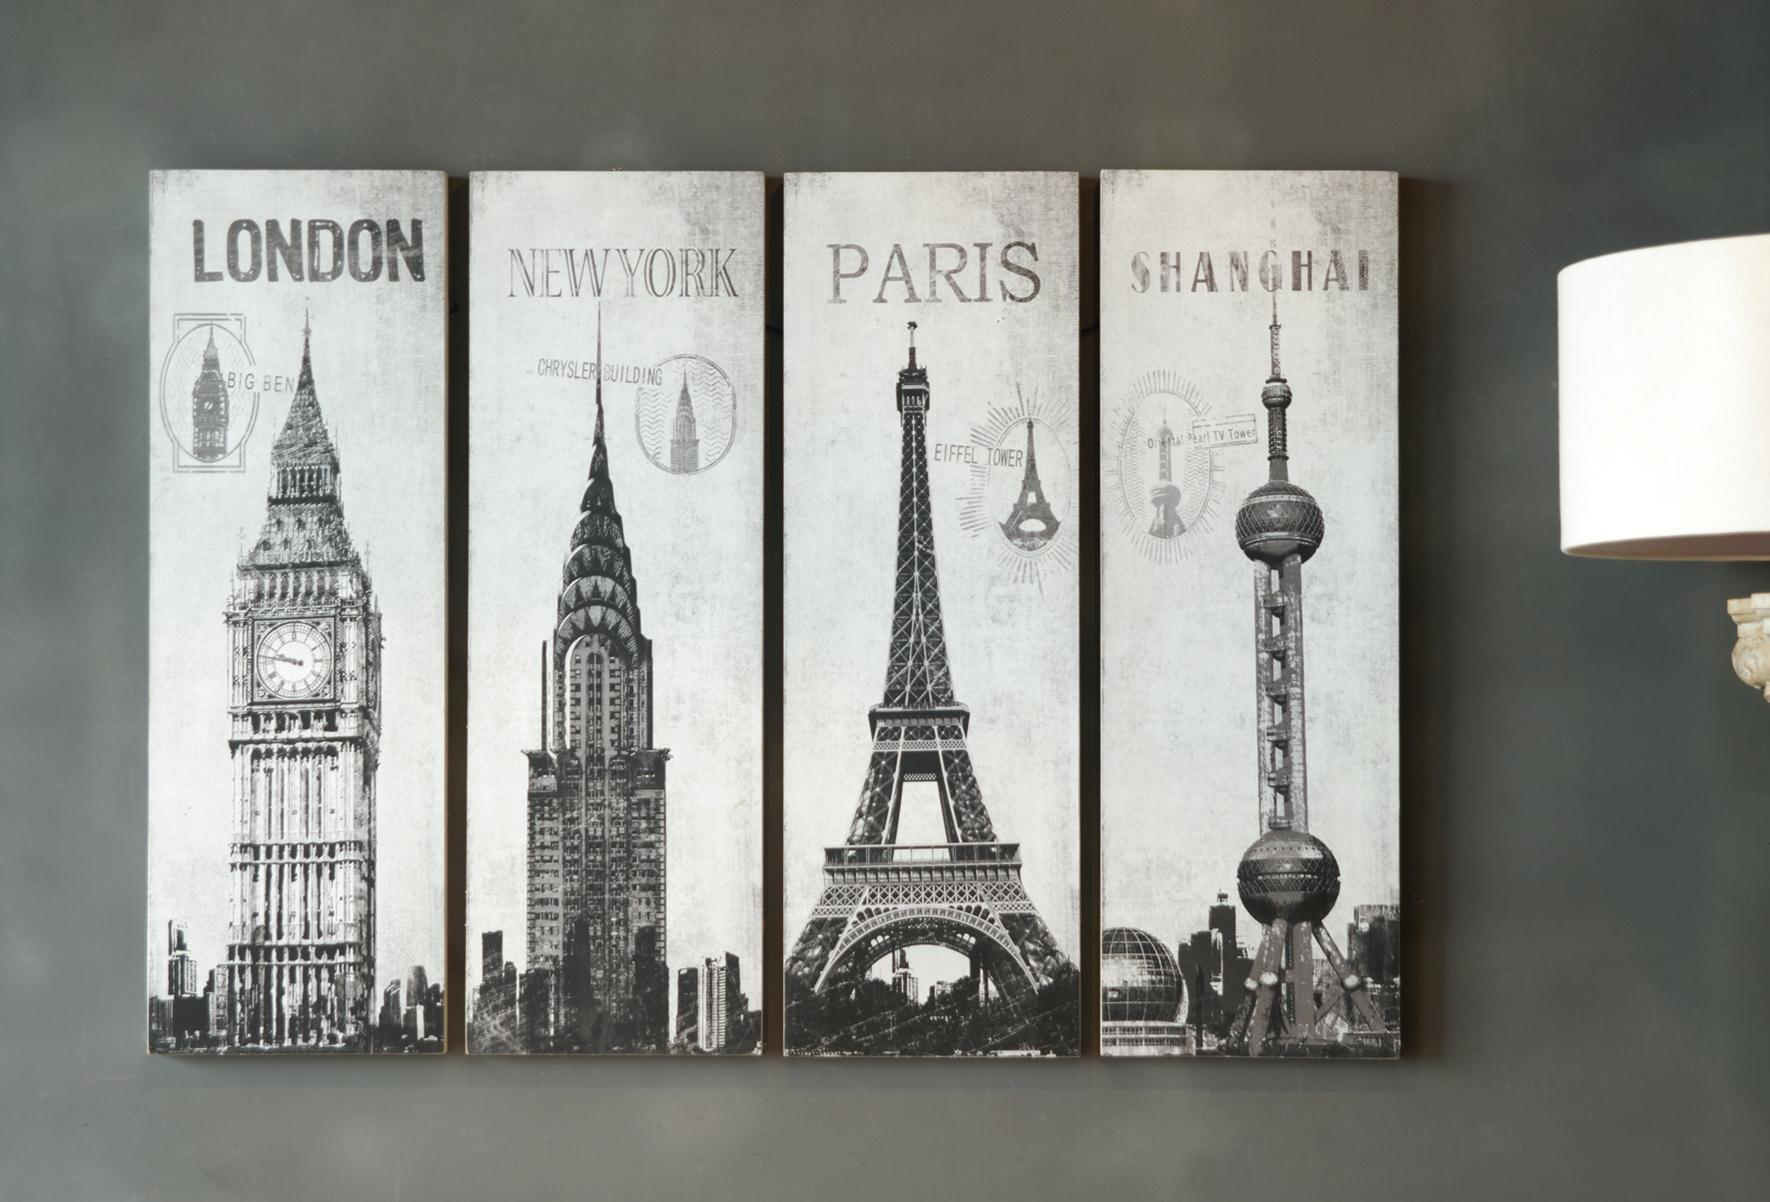 Wall Art Designs: Make Canvas Photo Wall Art Big Print Stock World With Regard To Big Wall Art (View 12 of 20)